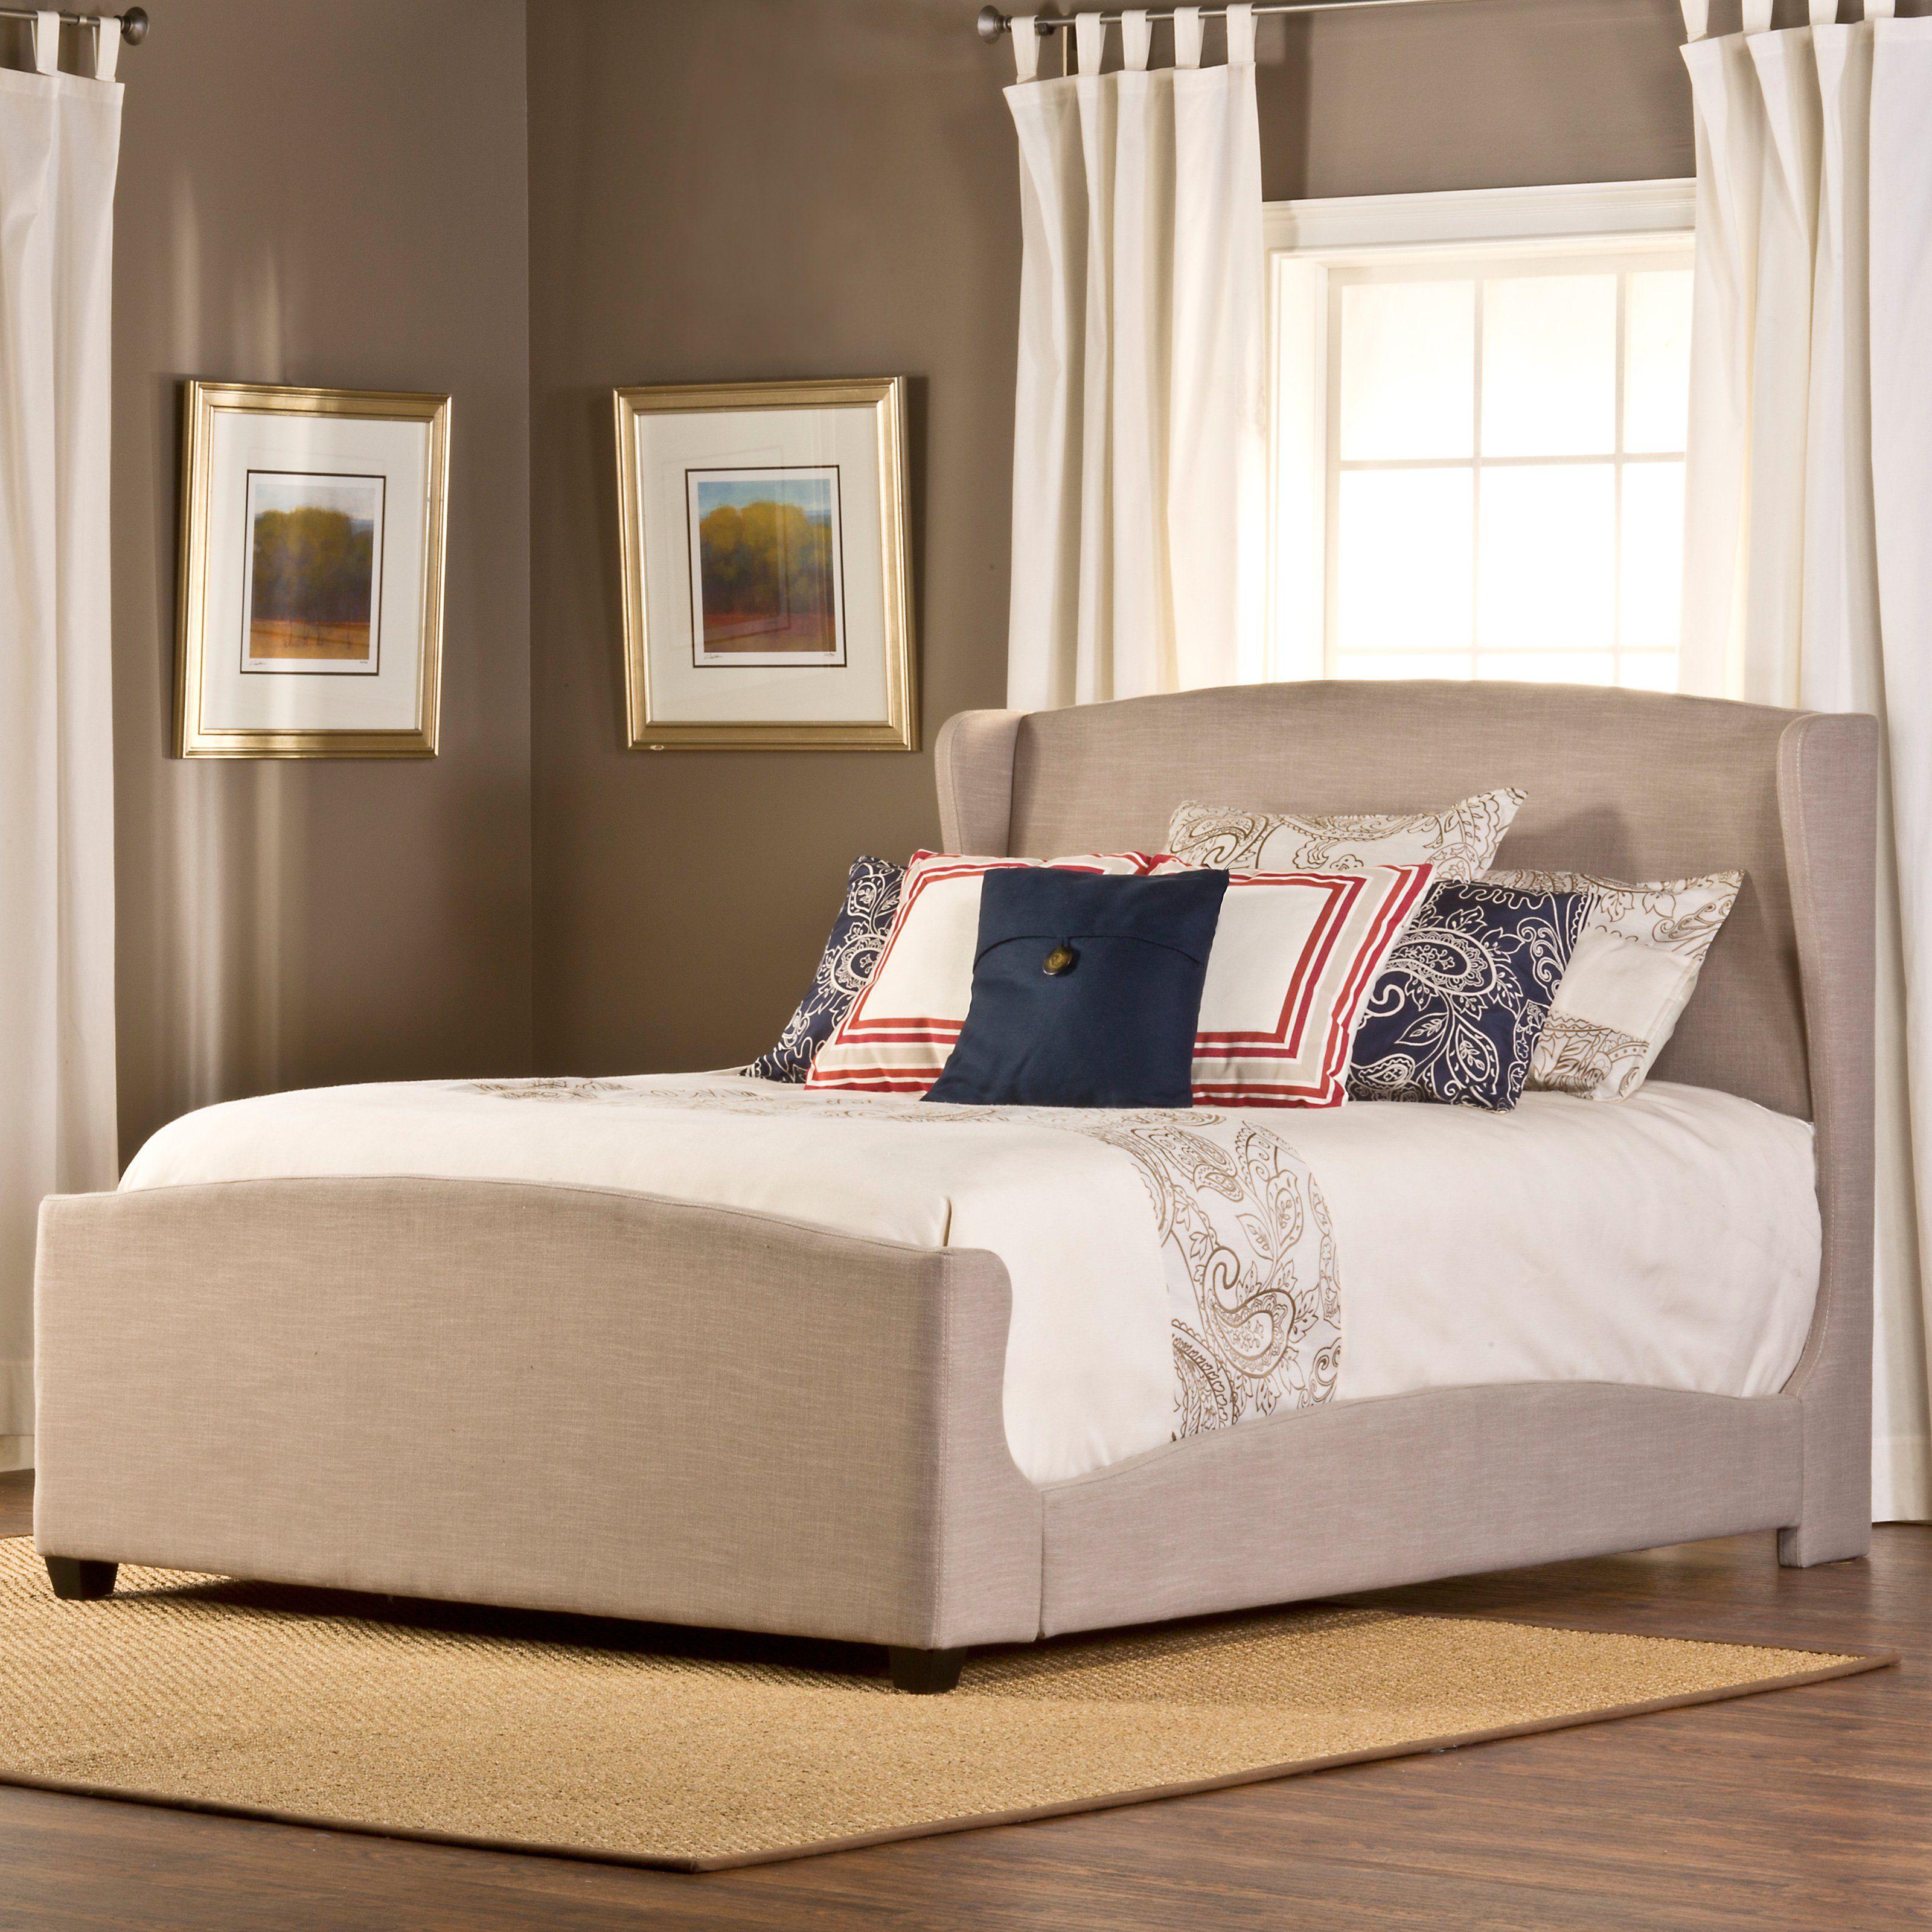 Barrington upholstered low profile bed khaki linen from hayneedle com